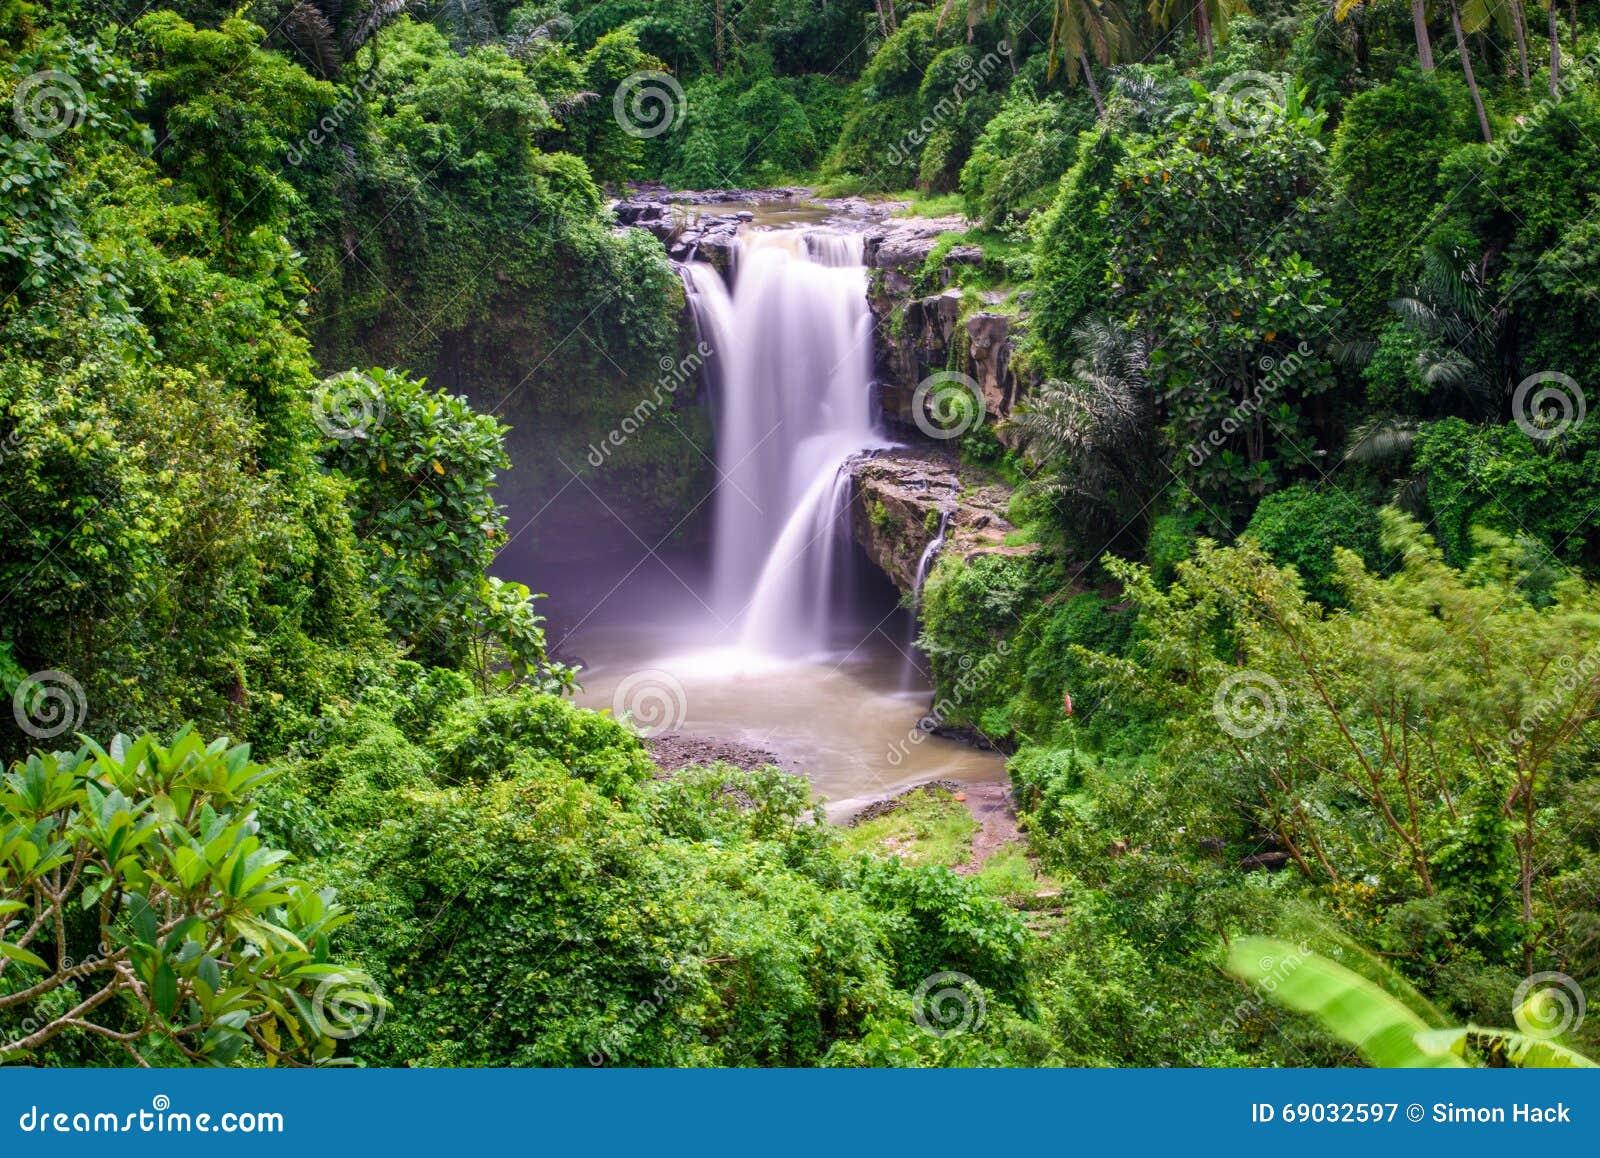 Tegenunganwaterval in Bali 5